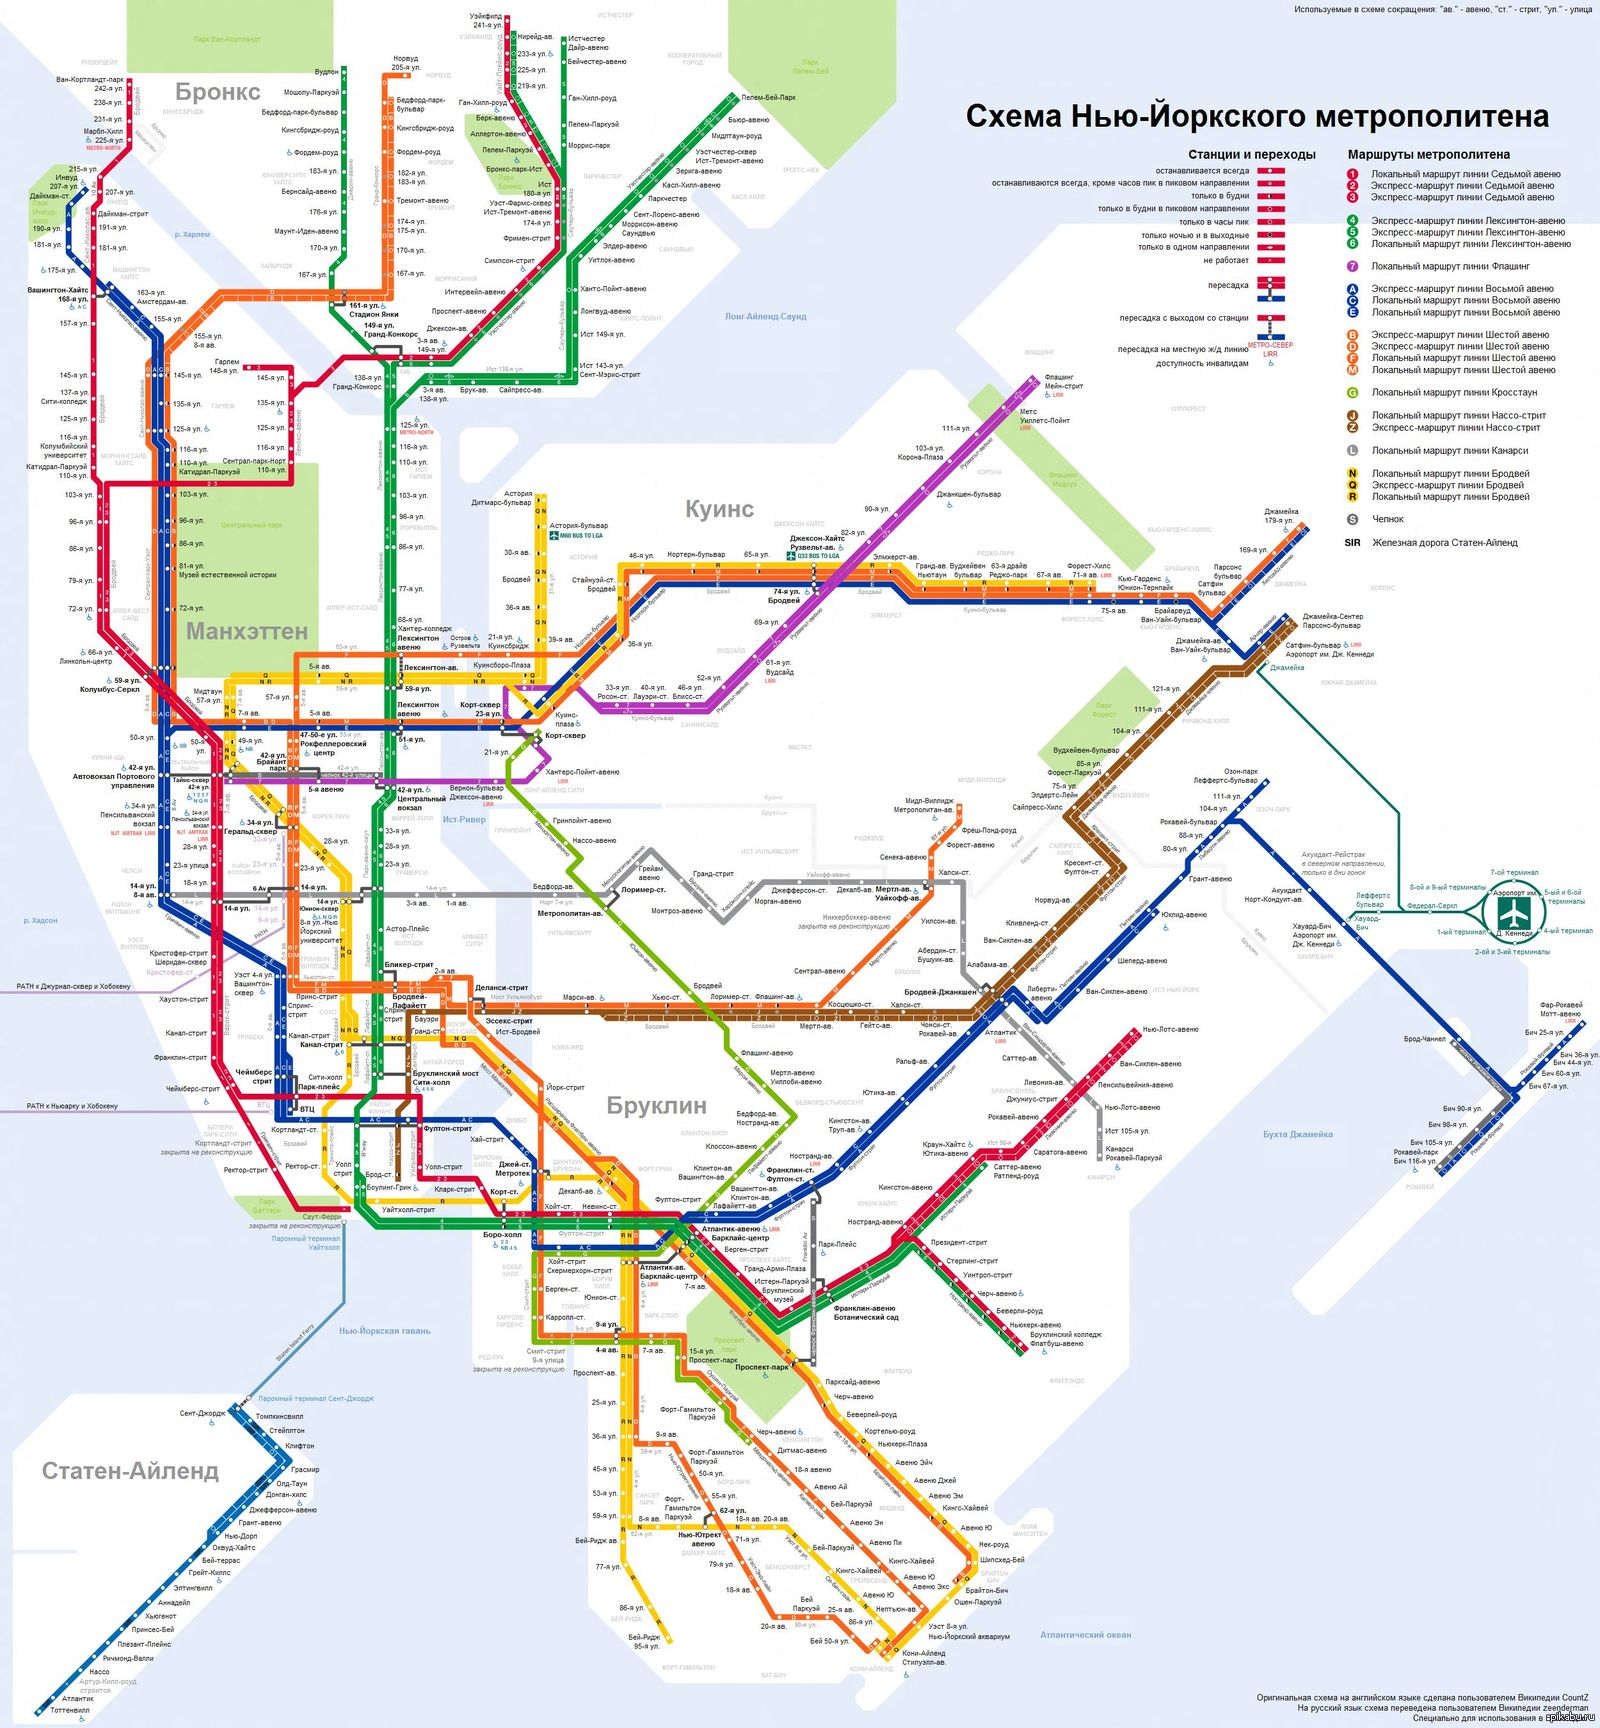 Схема метро нью-йорка на русском